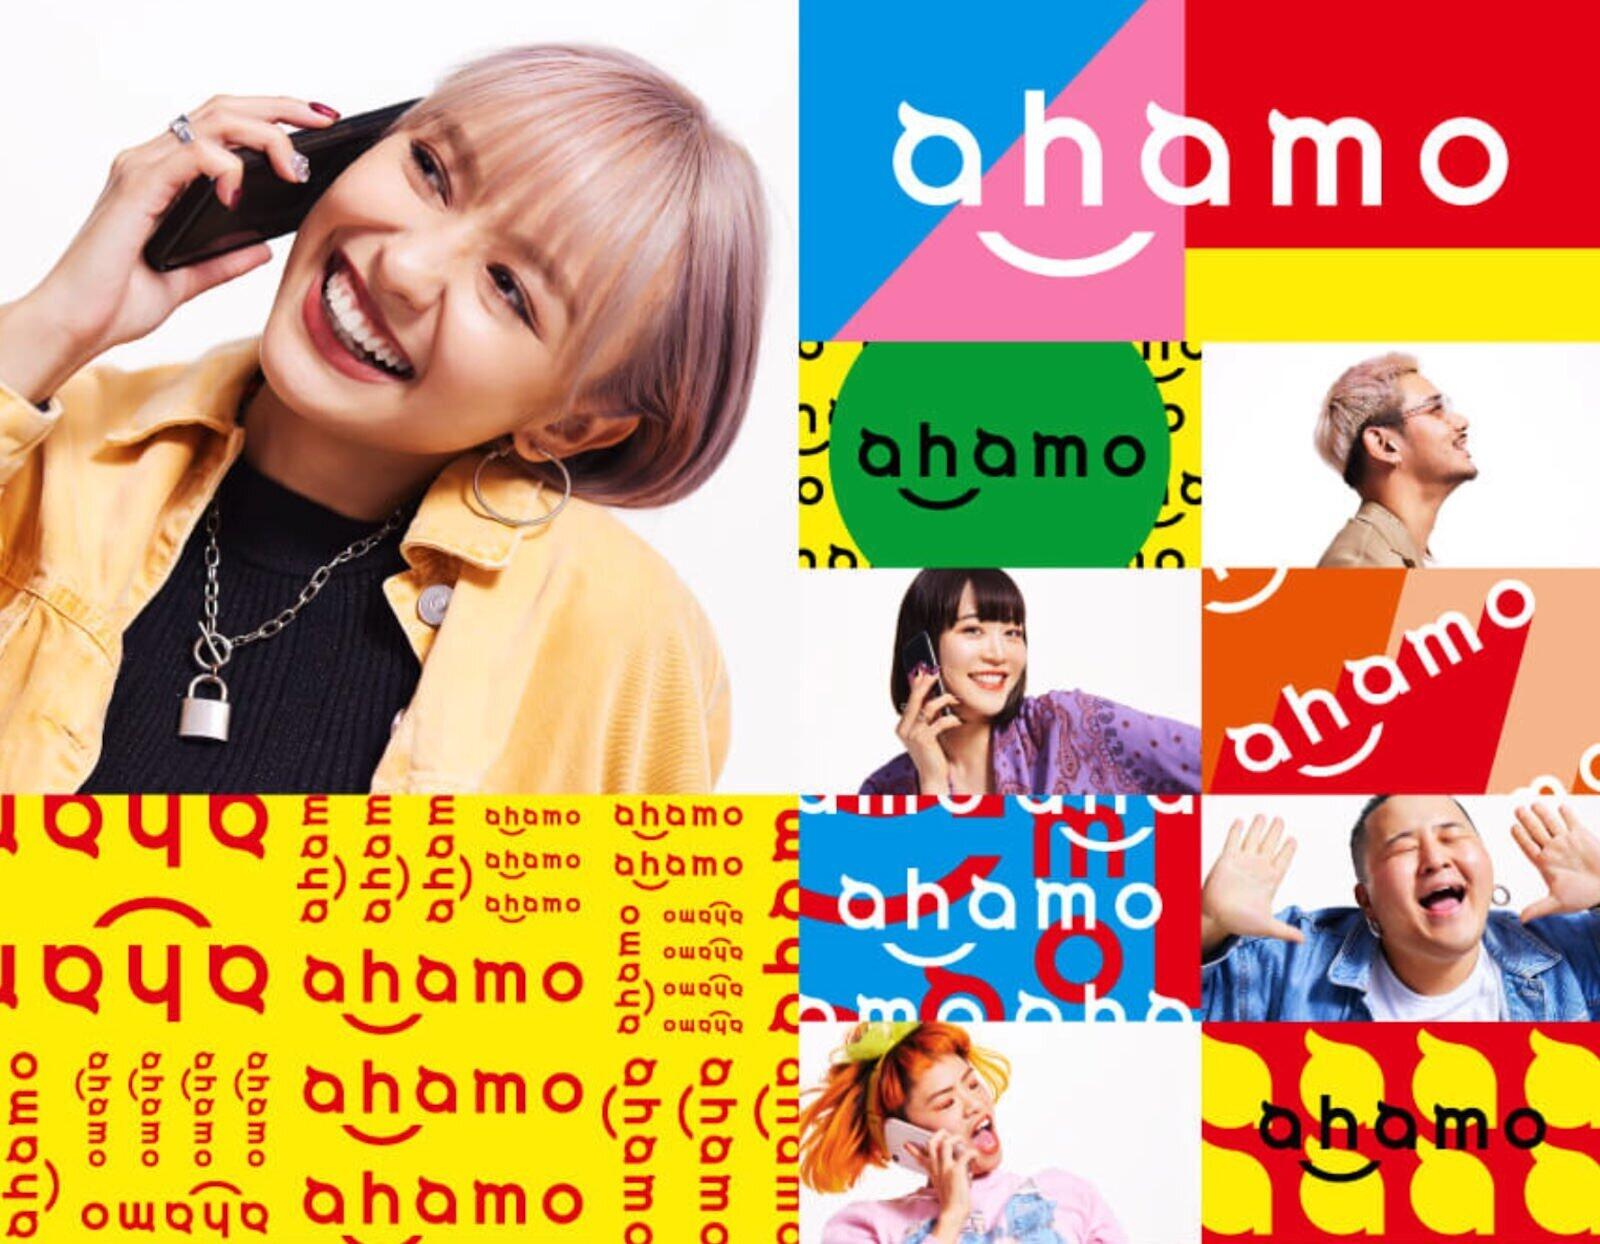 NTTドコモ「Ahamo」の公式サイト